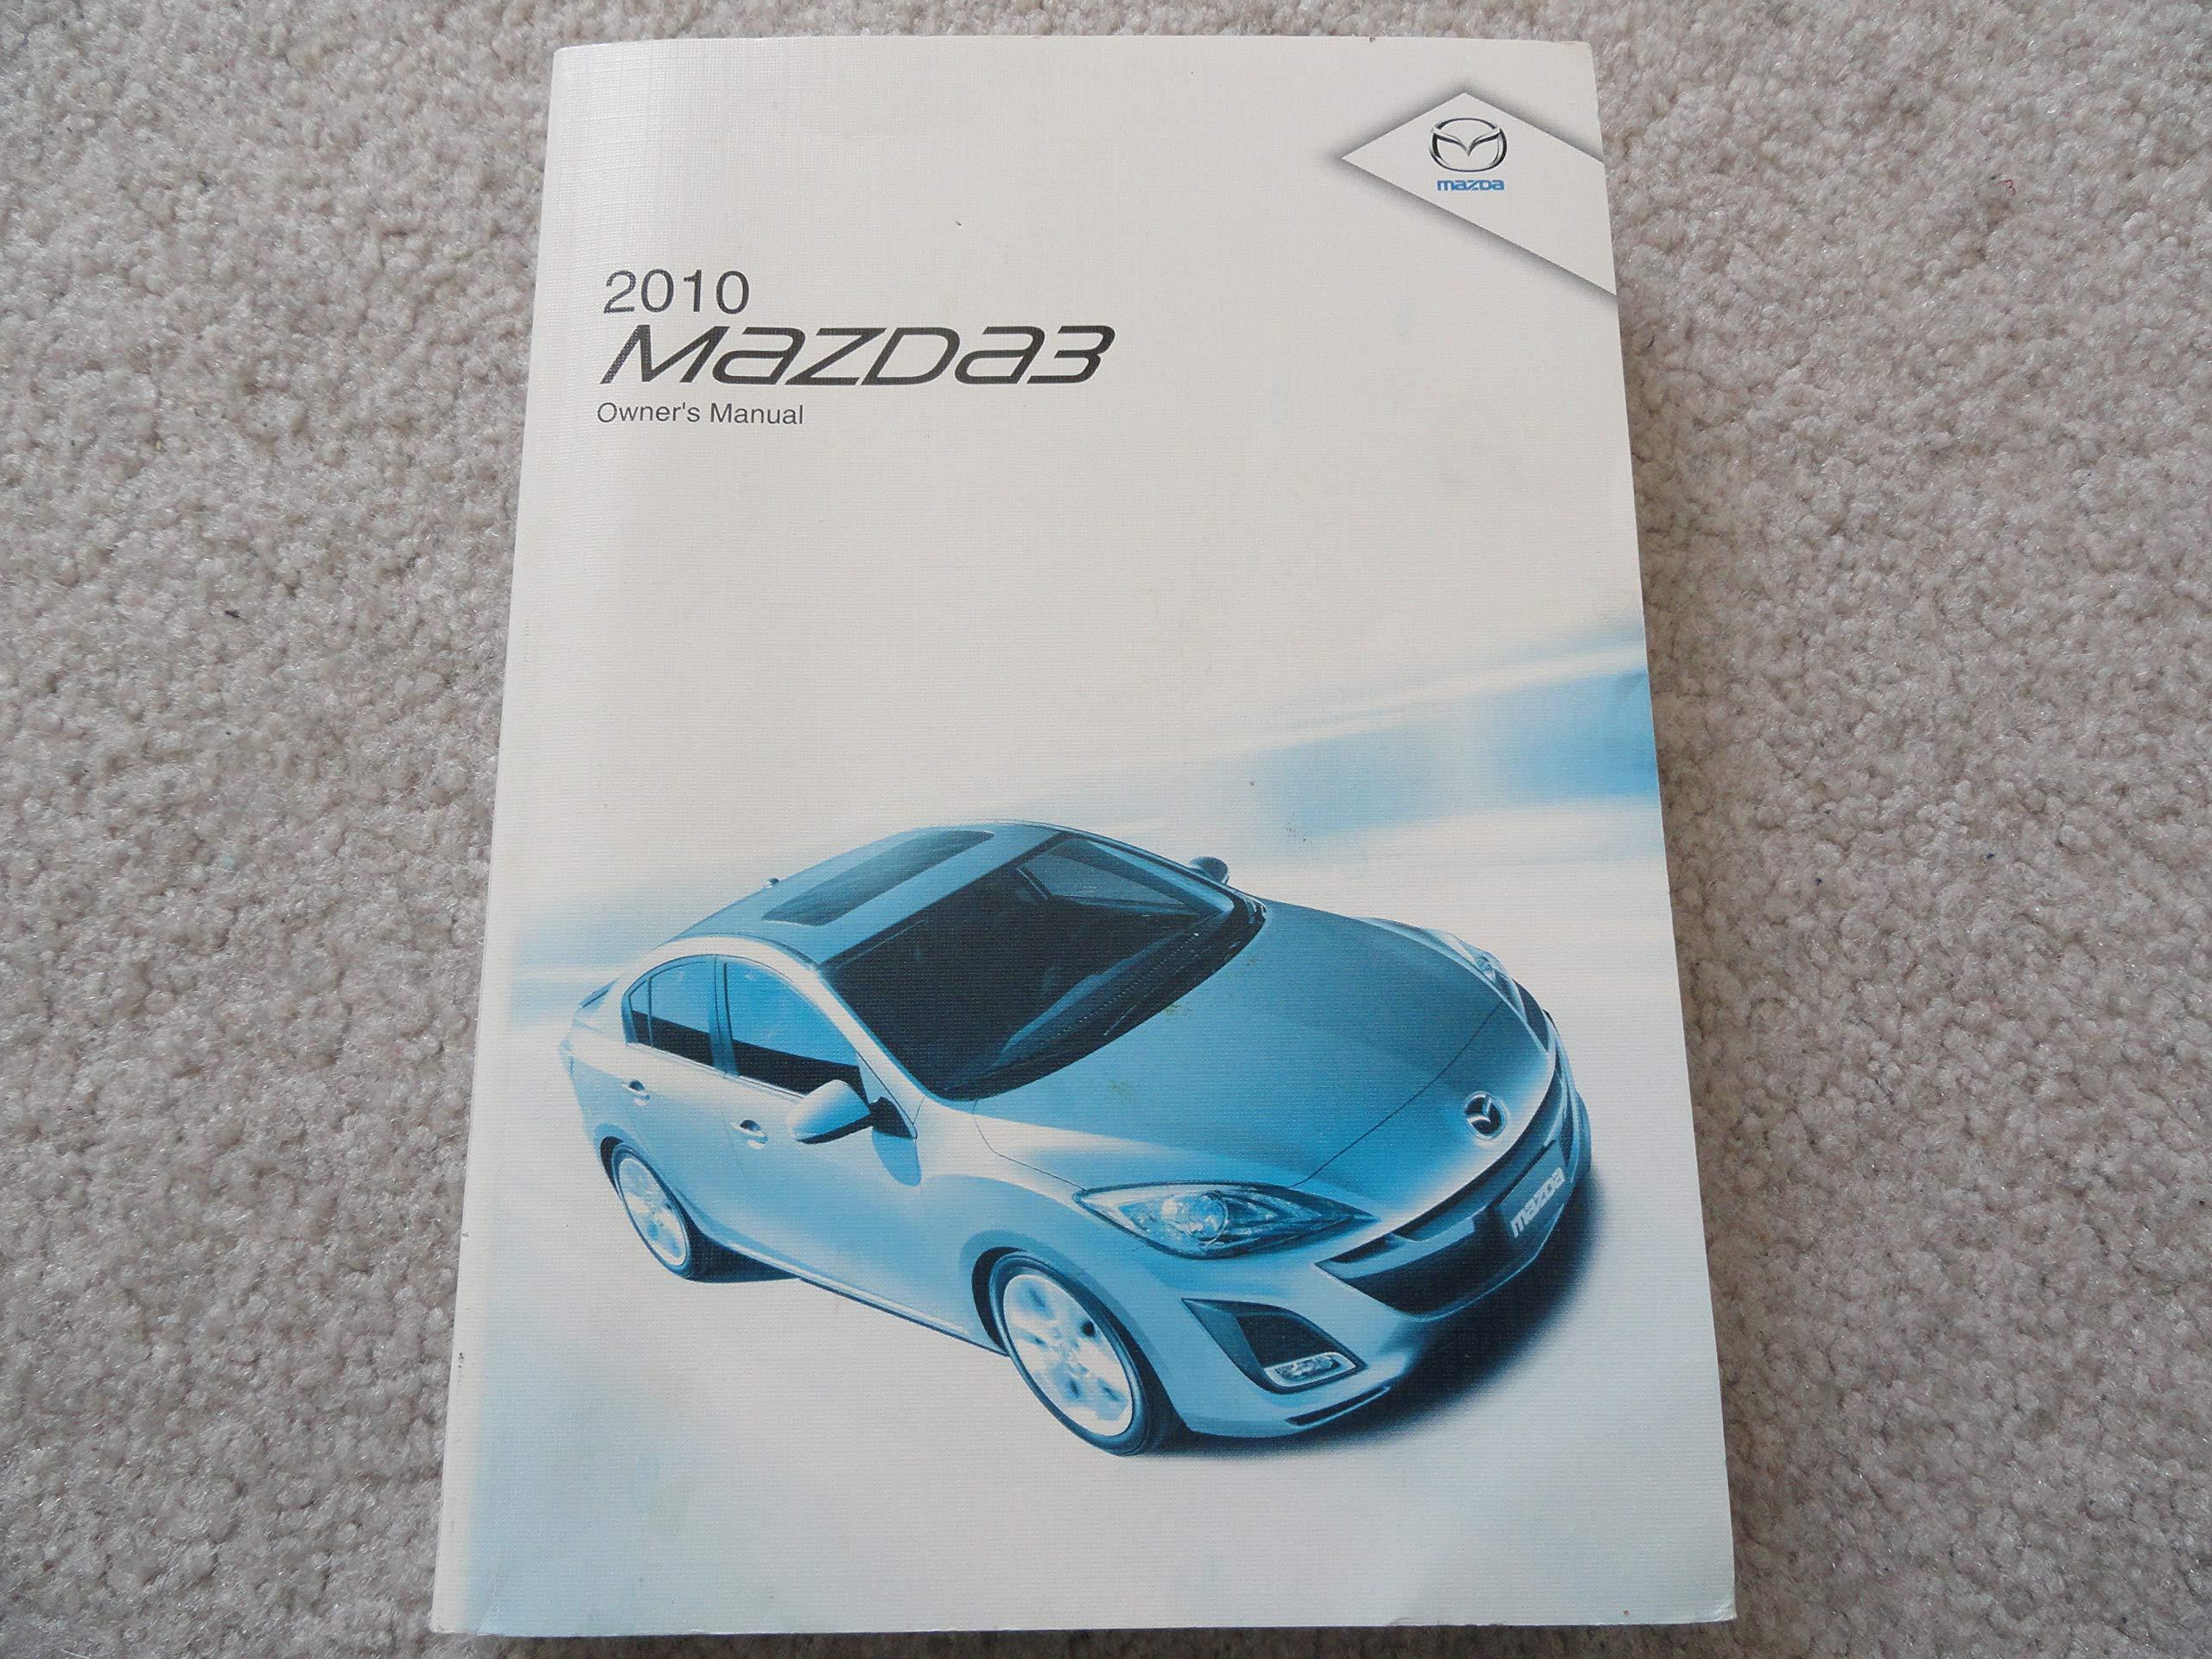 2012 mazda 3 owners manual: mazda: amazon. Com: books.